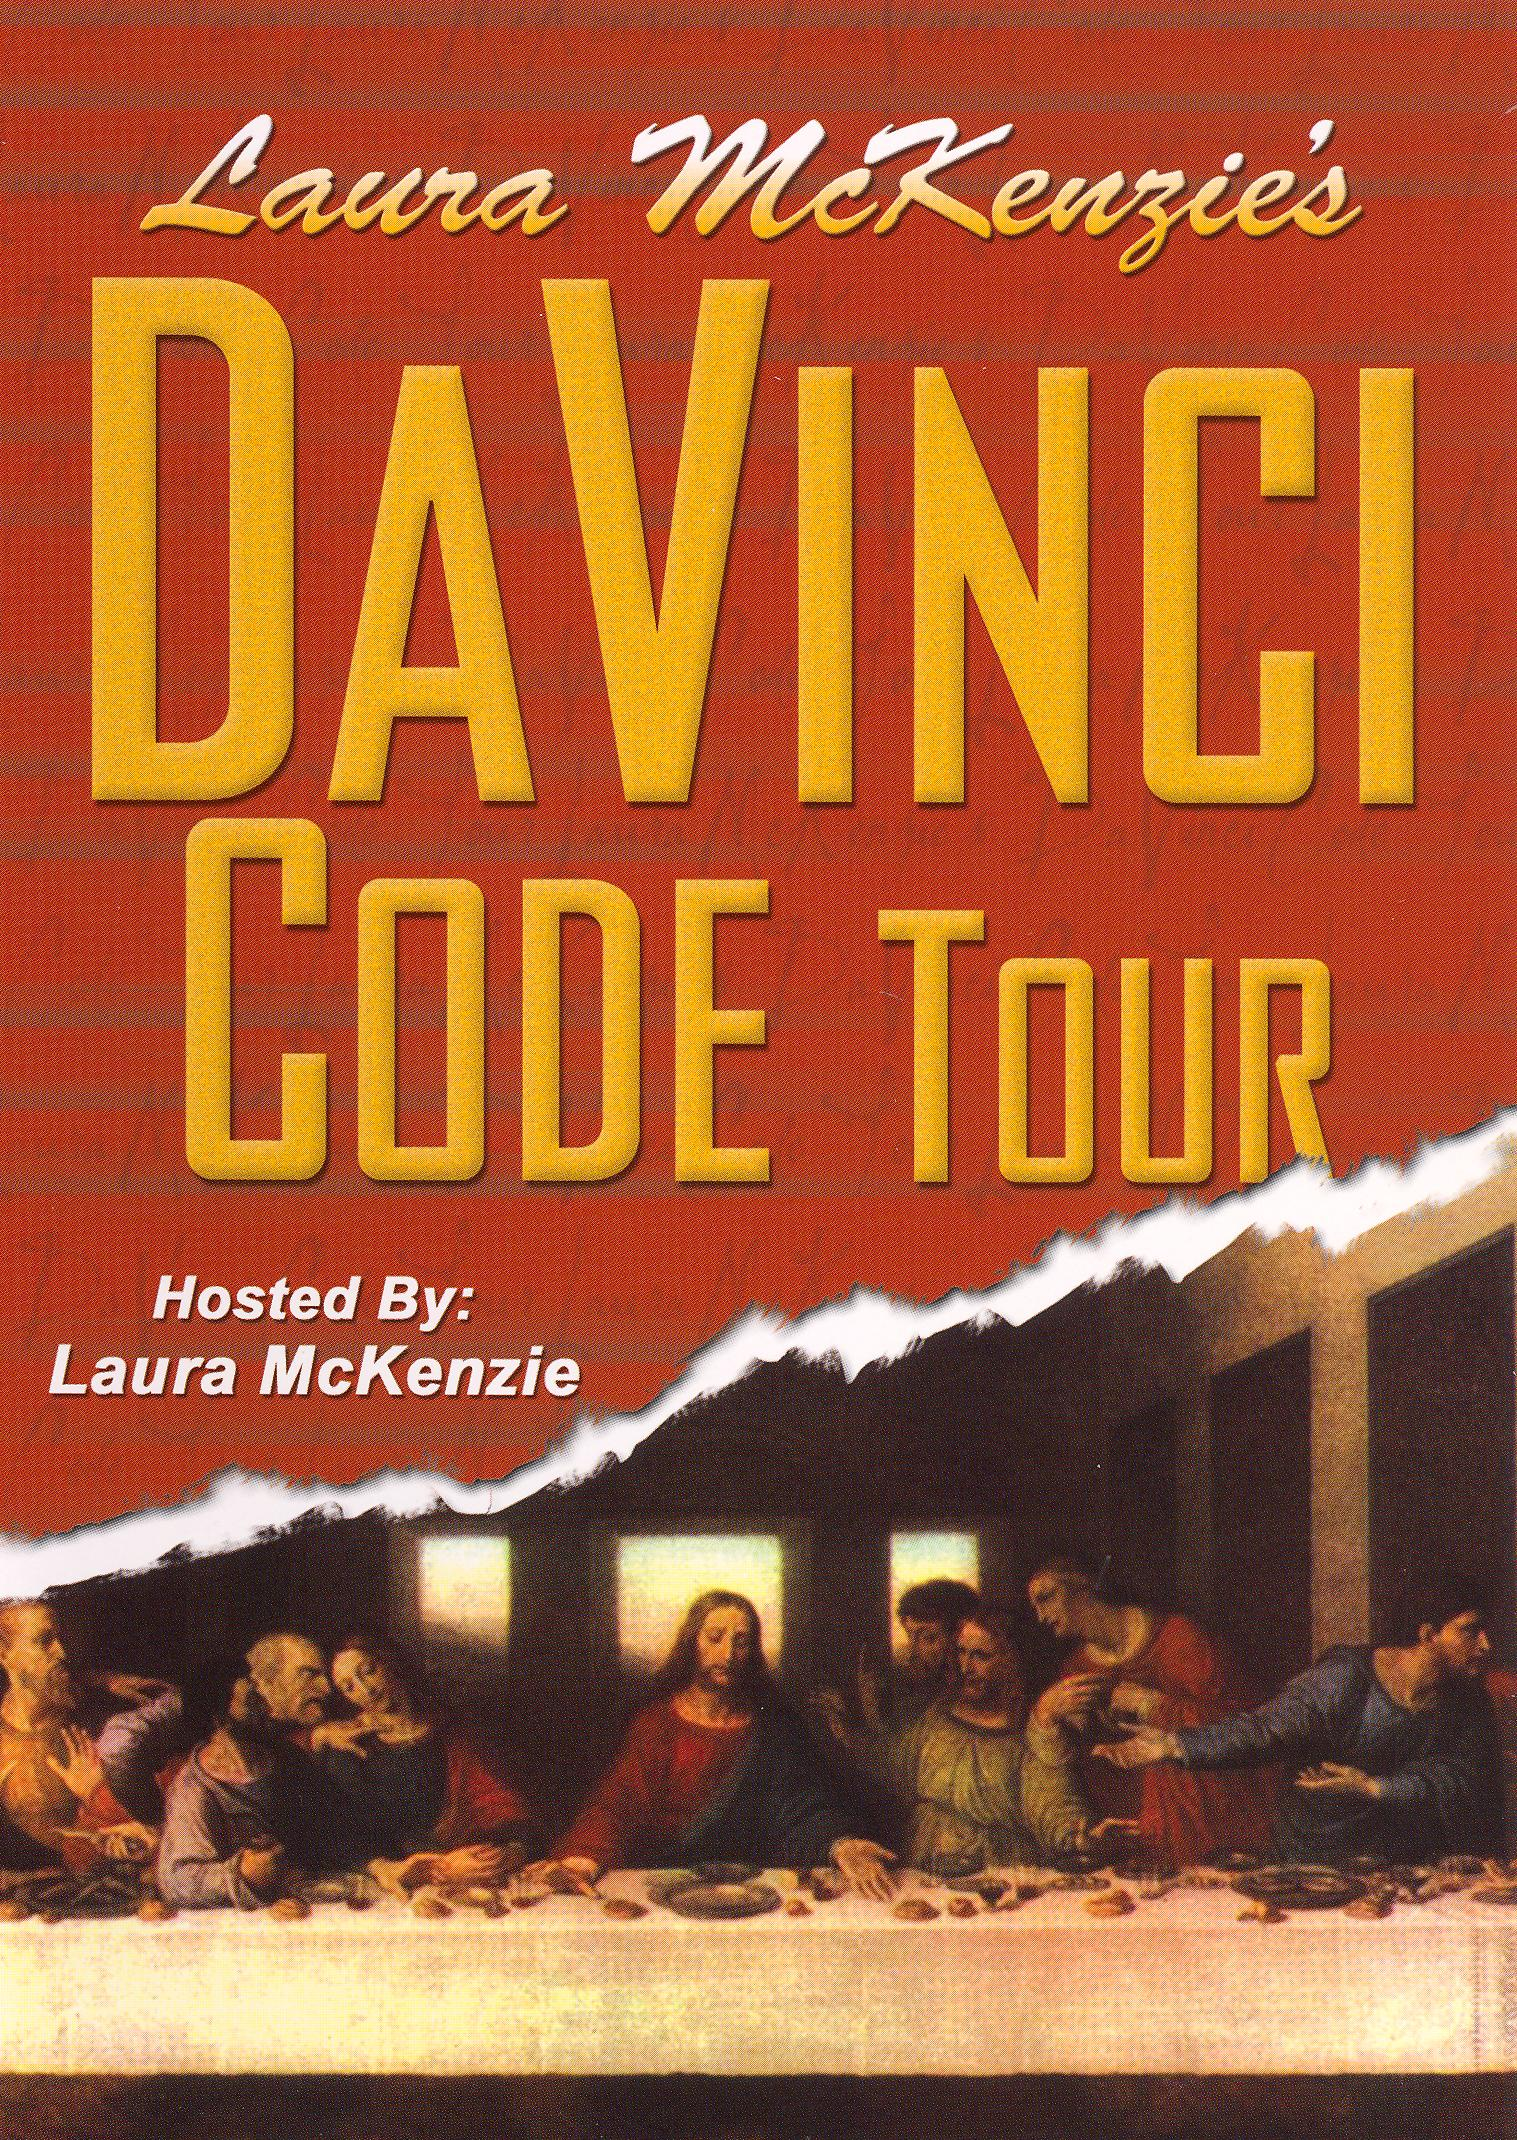 Laura McKenzie's Da Vinci Code Tour